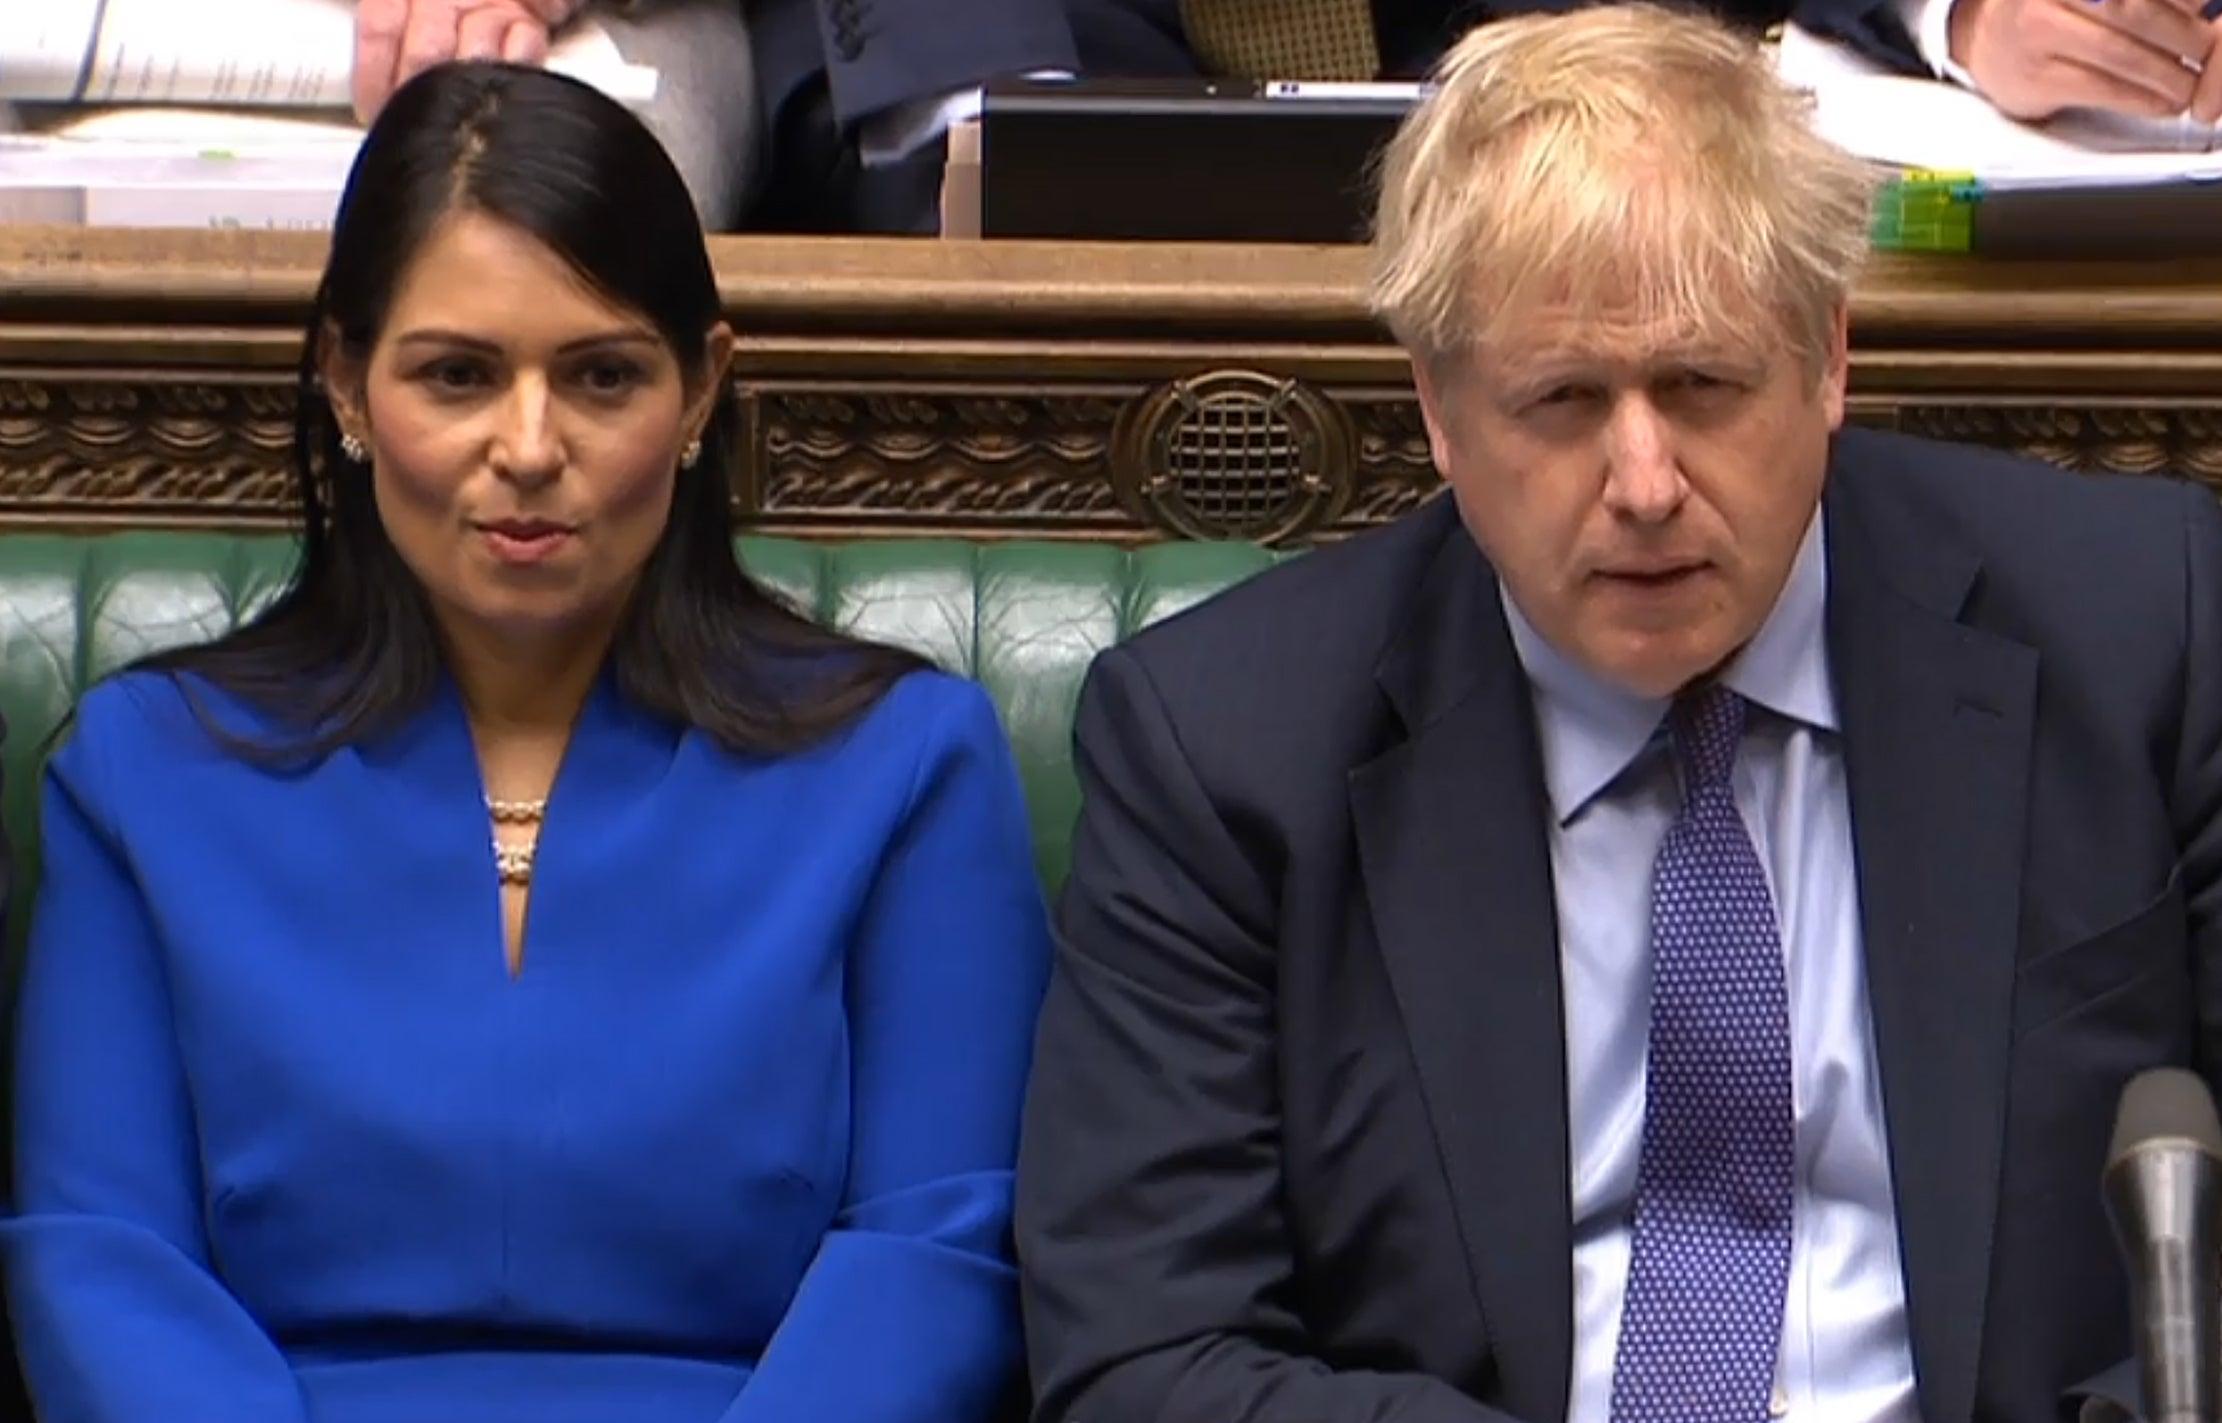 How Boris Johnson's hypocrisy could come back to bite him